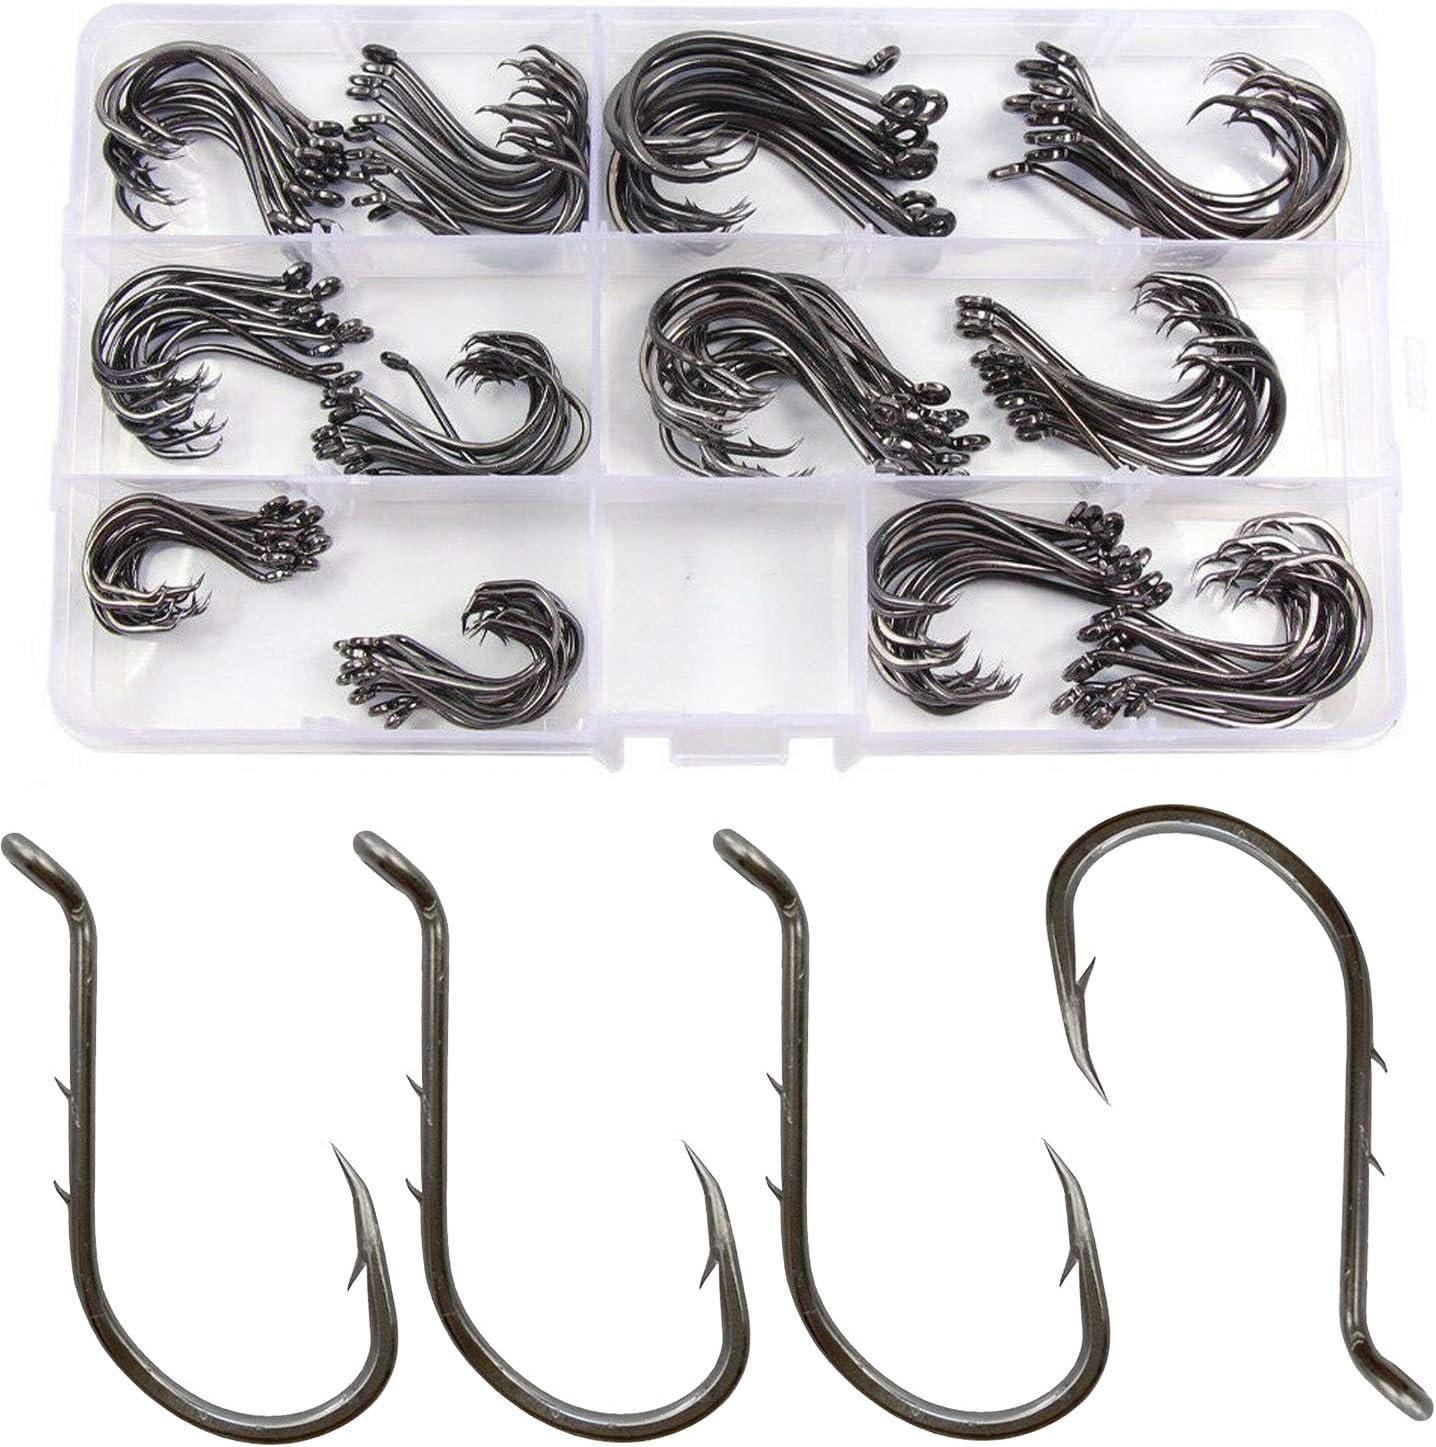 50pcs Octopus Fishing Hook Barbed Baitholder Fishhook Carbon Steel Fishhook 8299